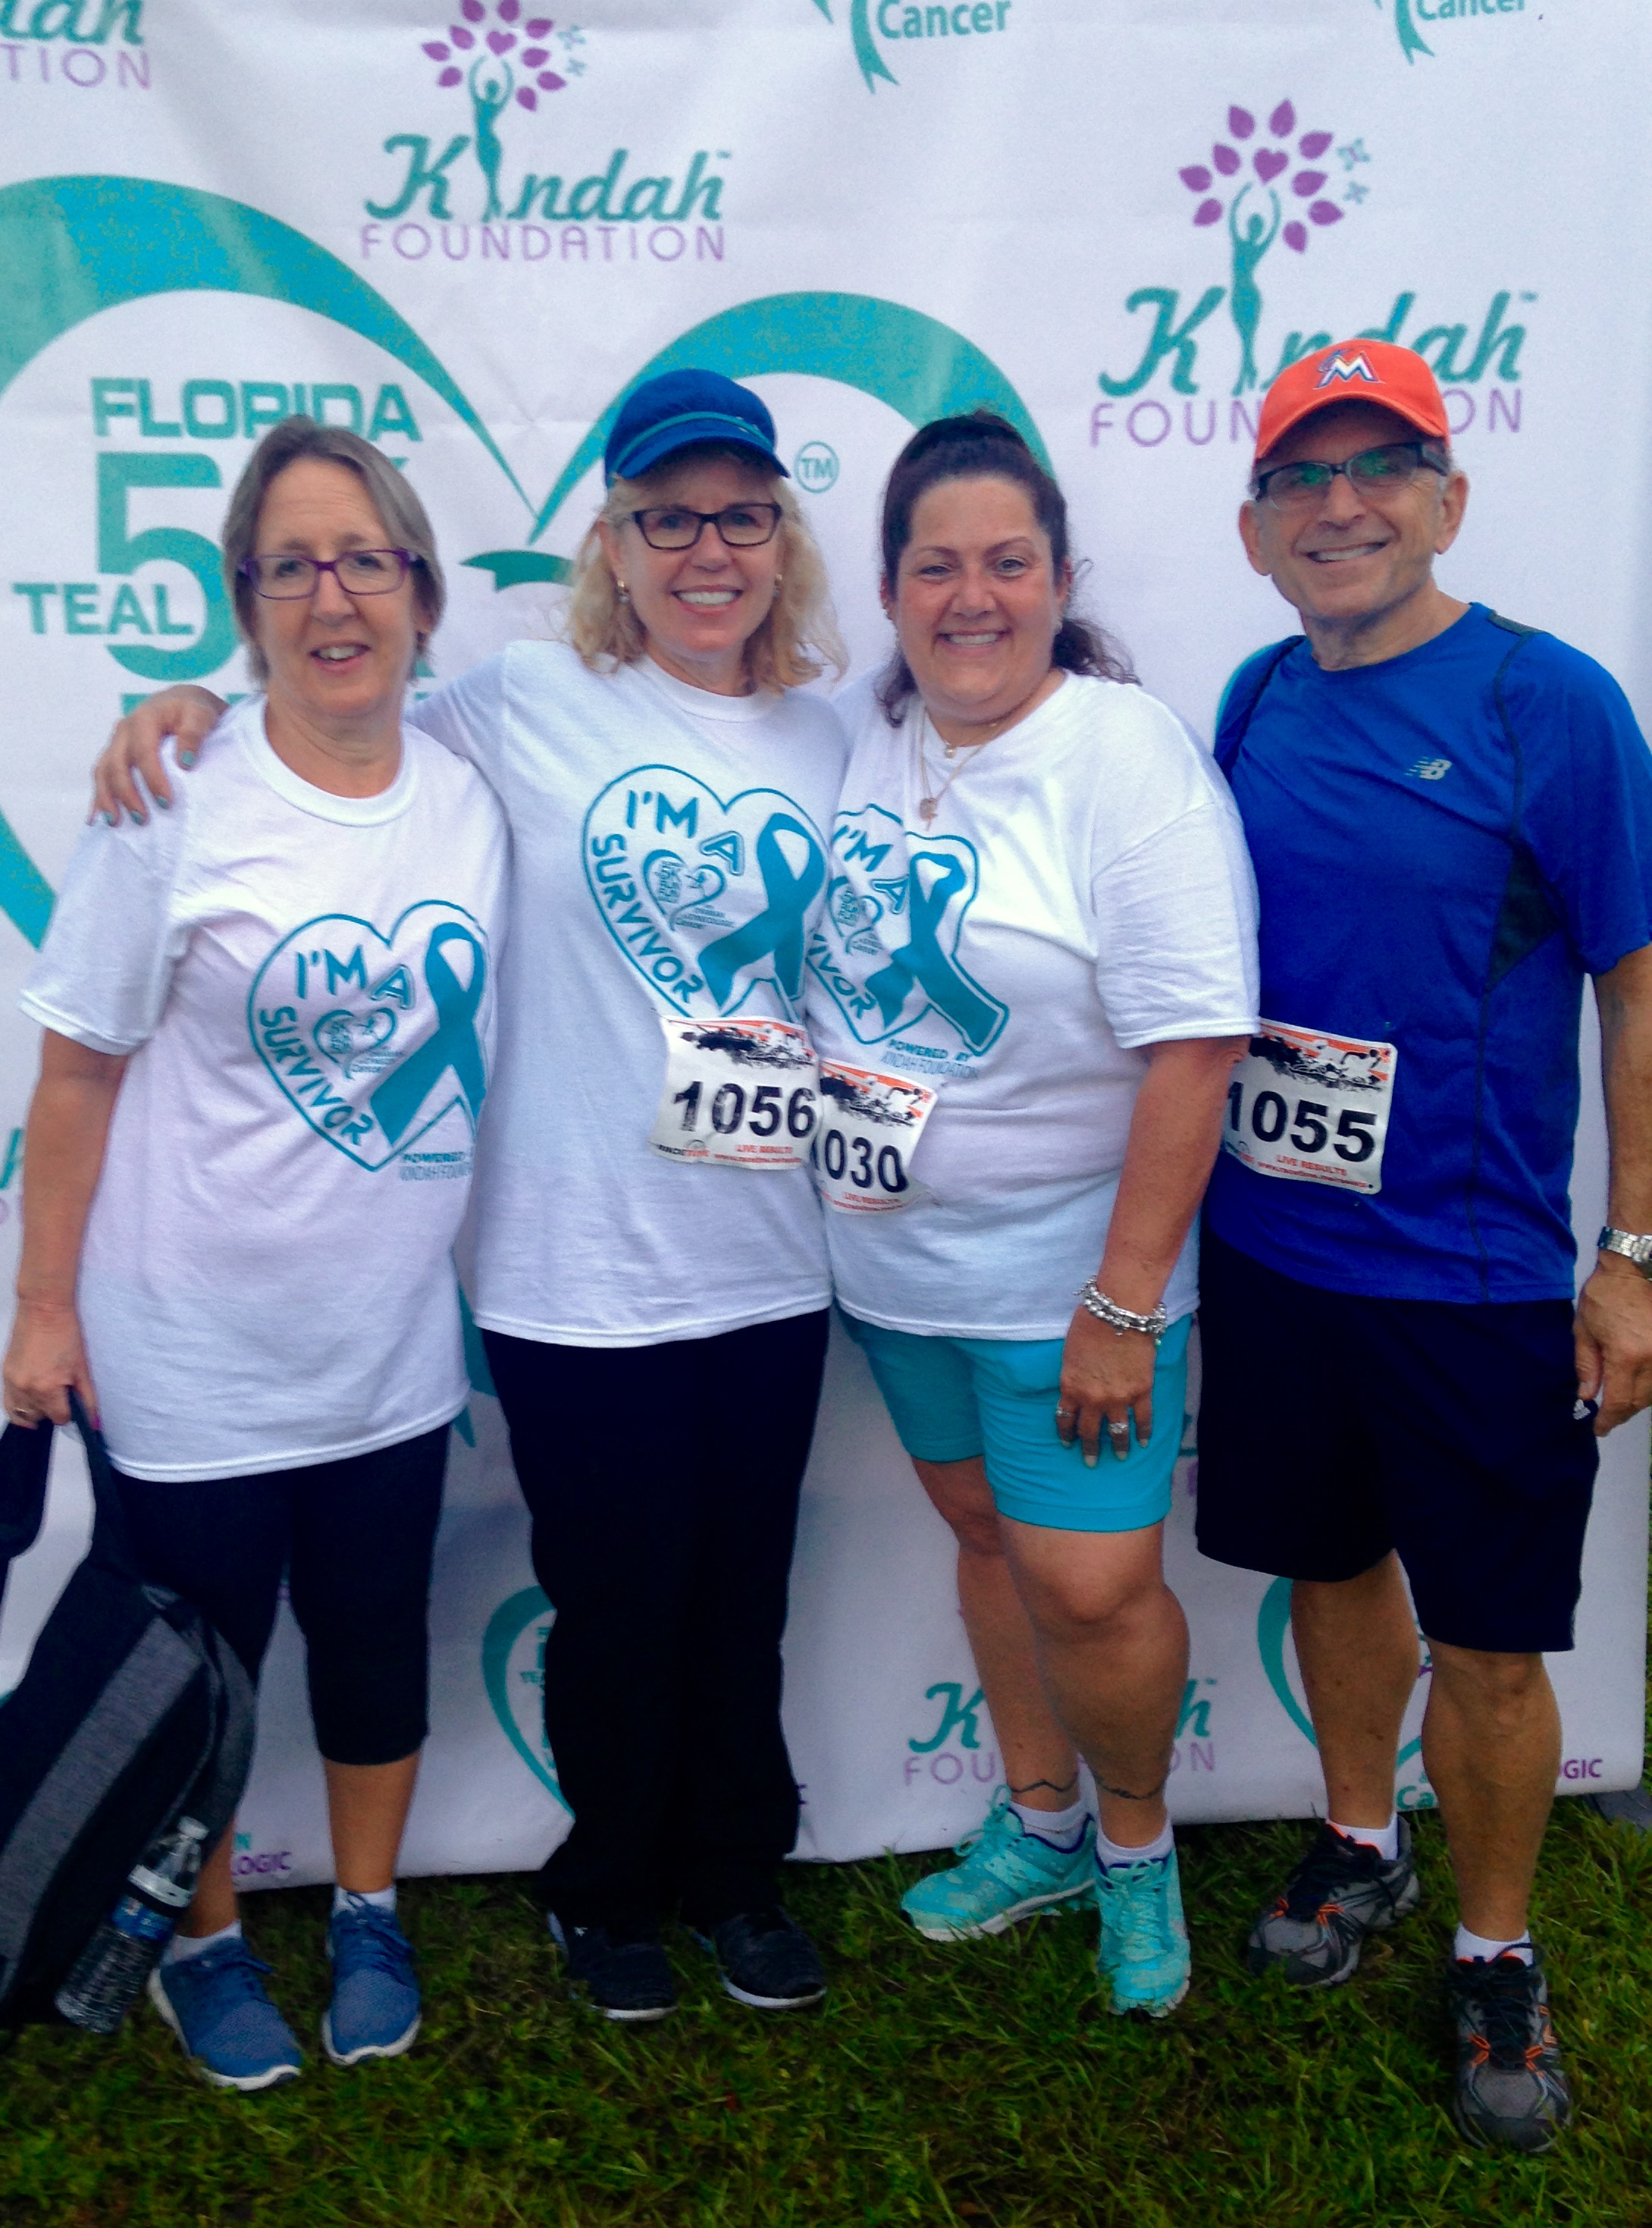 FullSizeRender 009 - Florida Teal 5K Run/ Fun Walk 2017